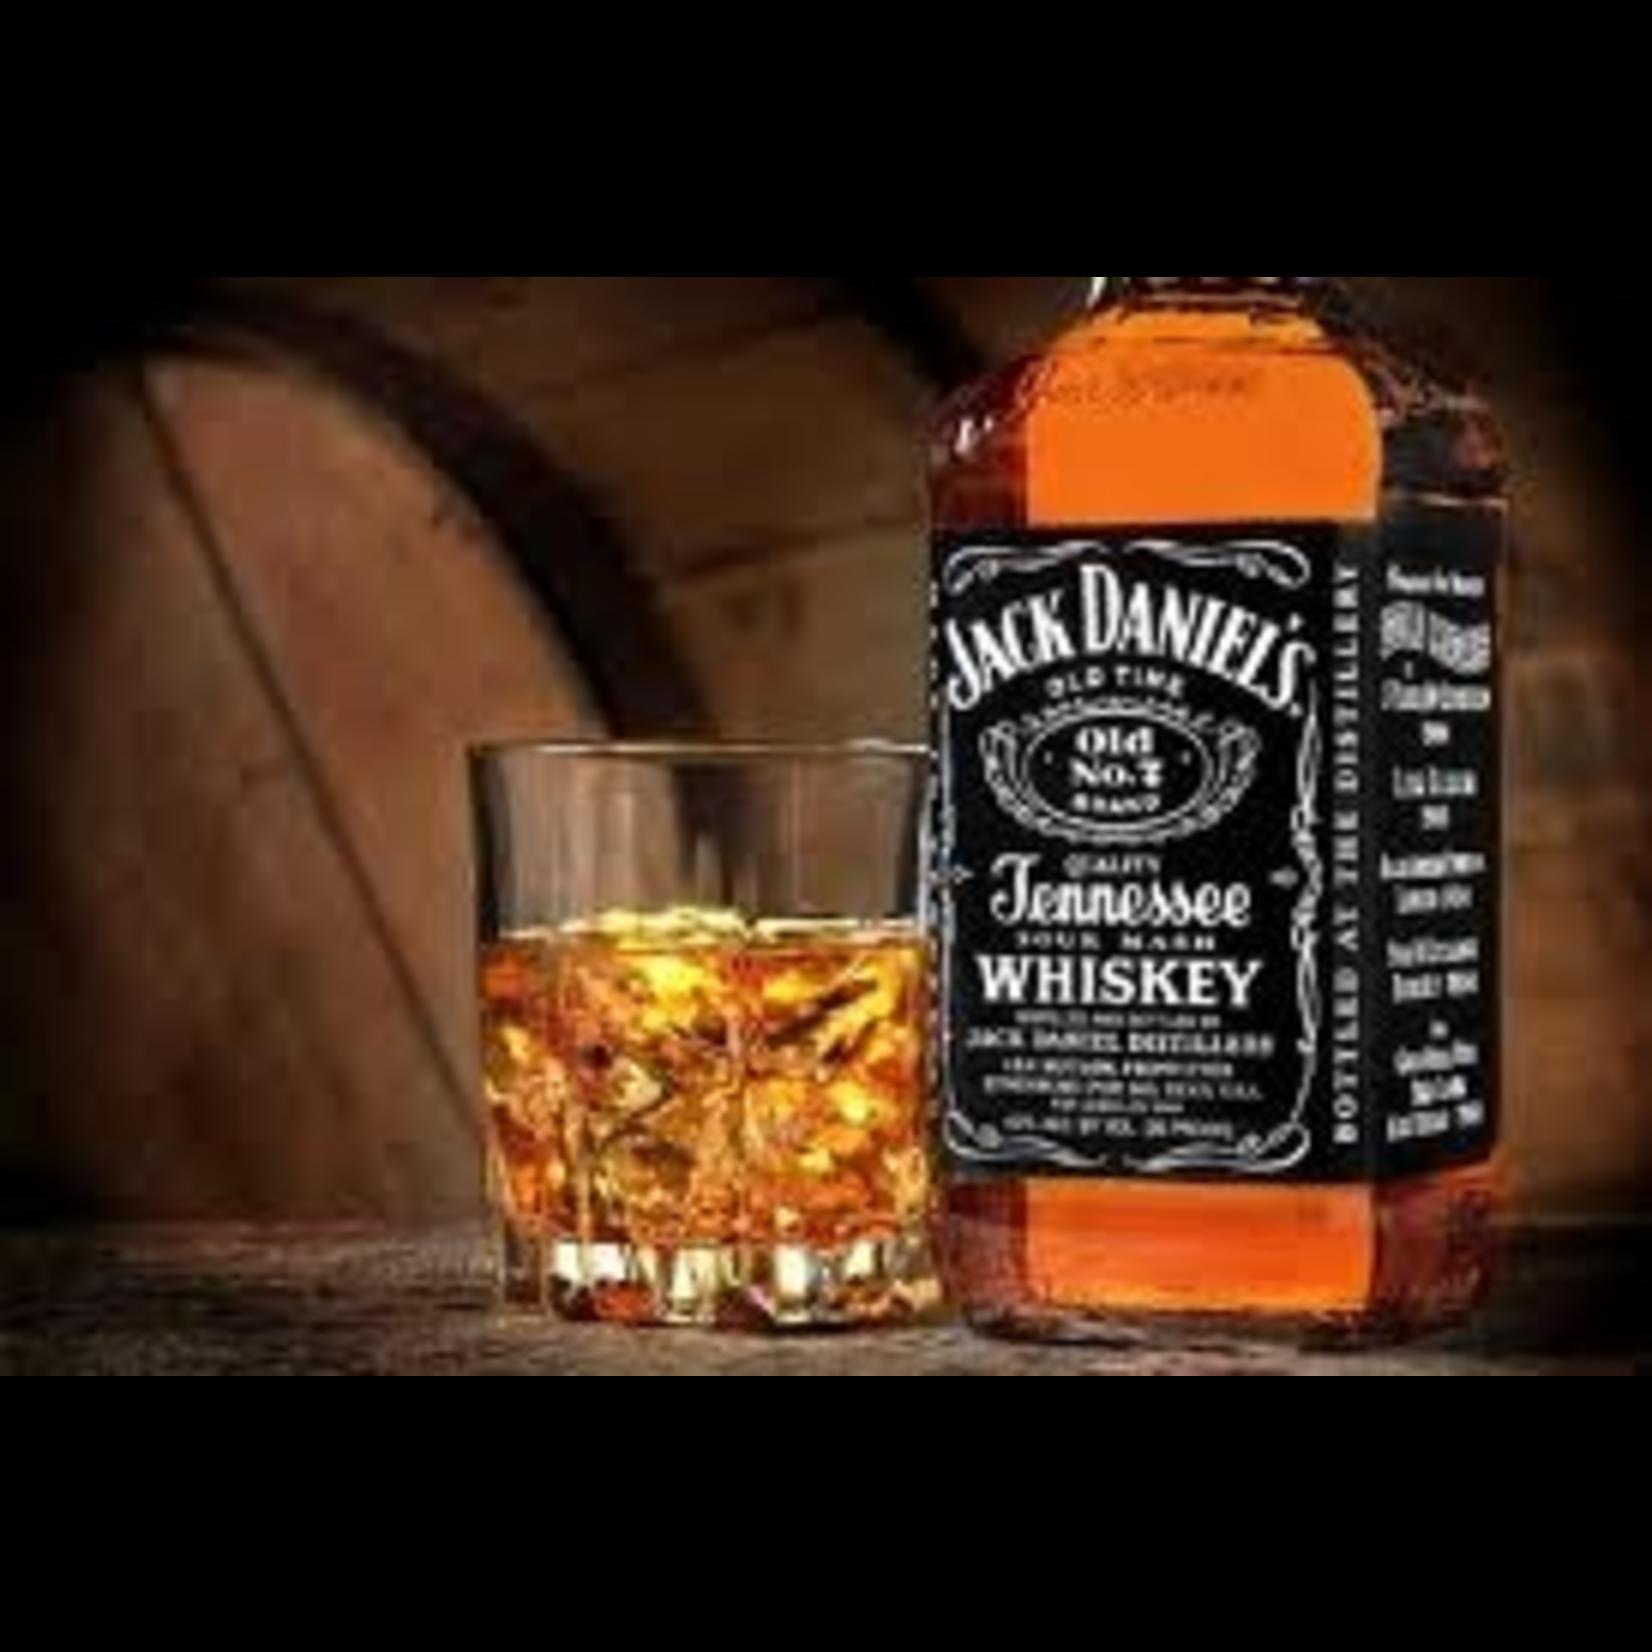 Spirits Jack Daniel's Tennessee Sour Mash Old No. 7 Black Label  Whiskey